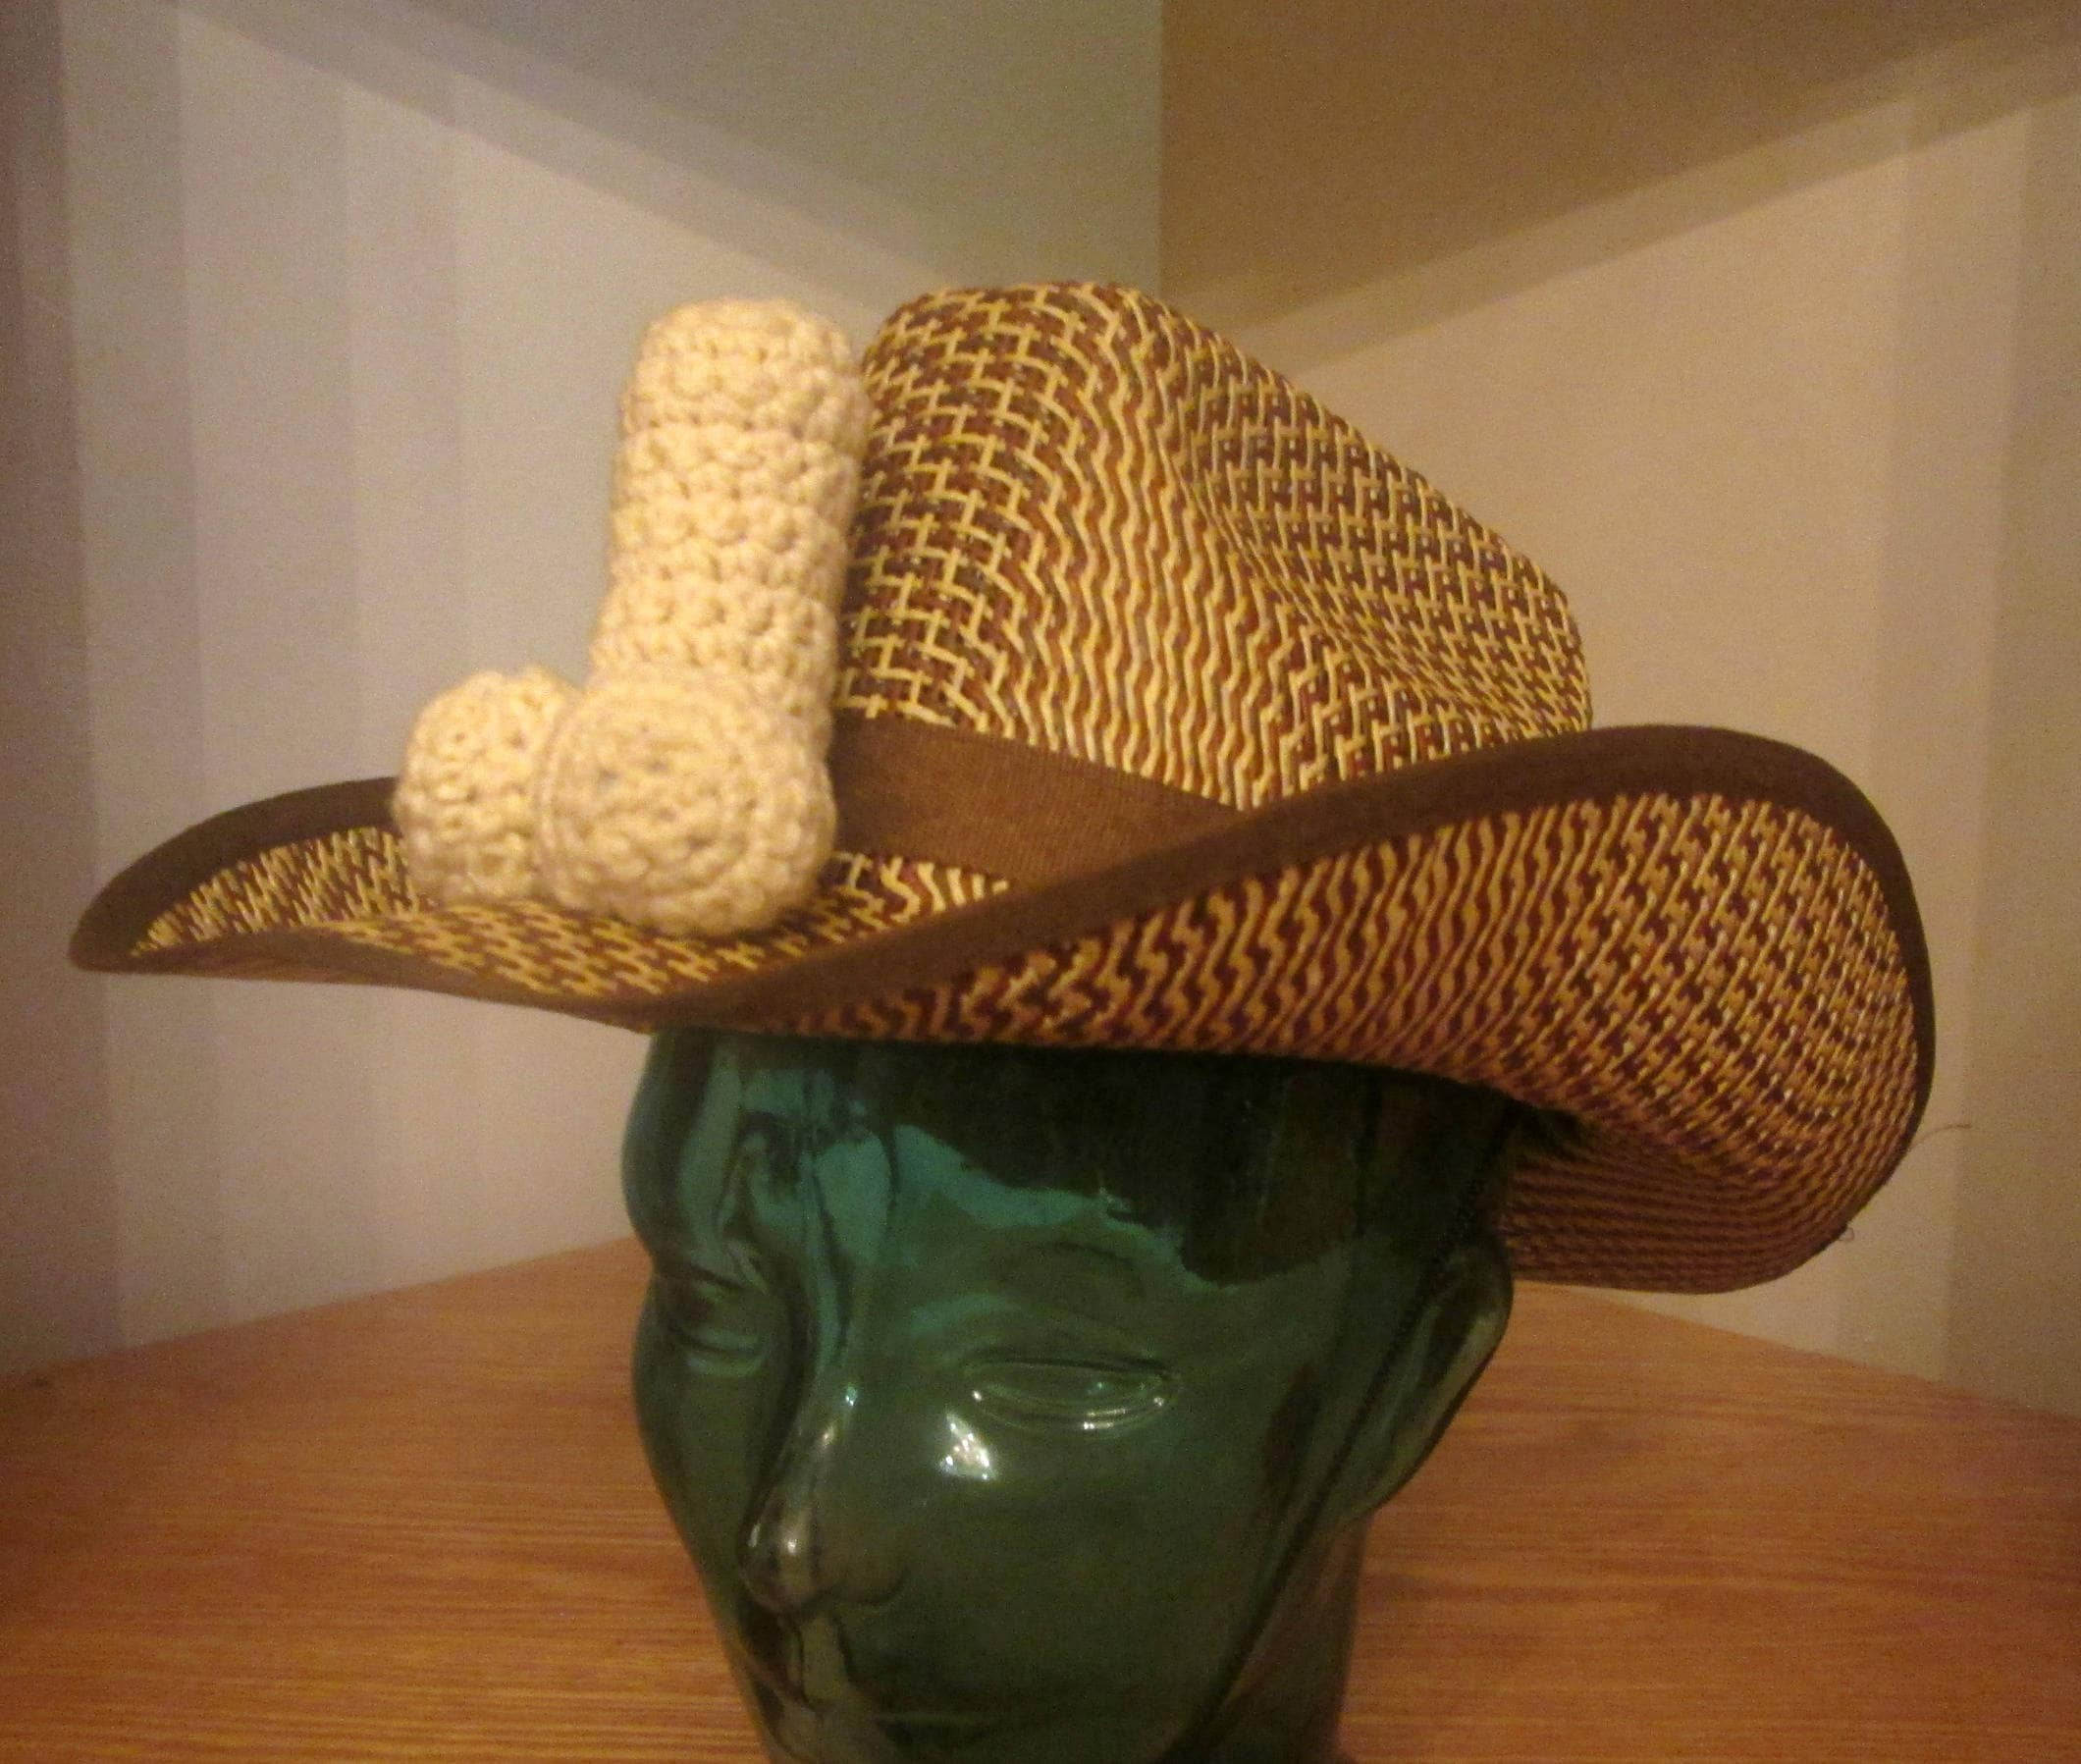 94c962cfc PENIS STRAW HAT, gay cowboy, bachelorette wear, crochet penis, gay pride,  queer hat, pride hat, funny dick hat, straw cock hat, mature hat